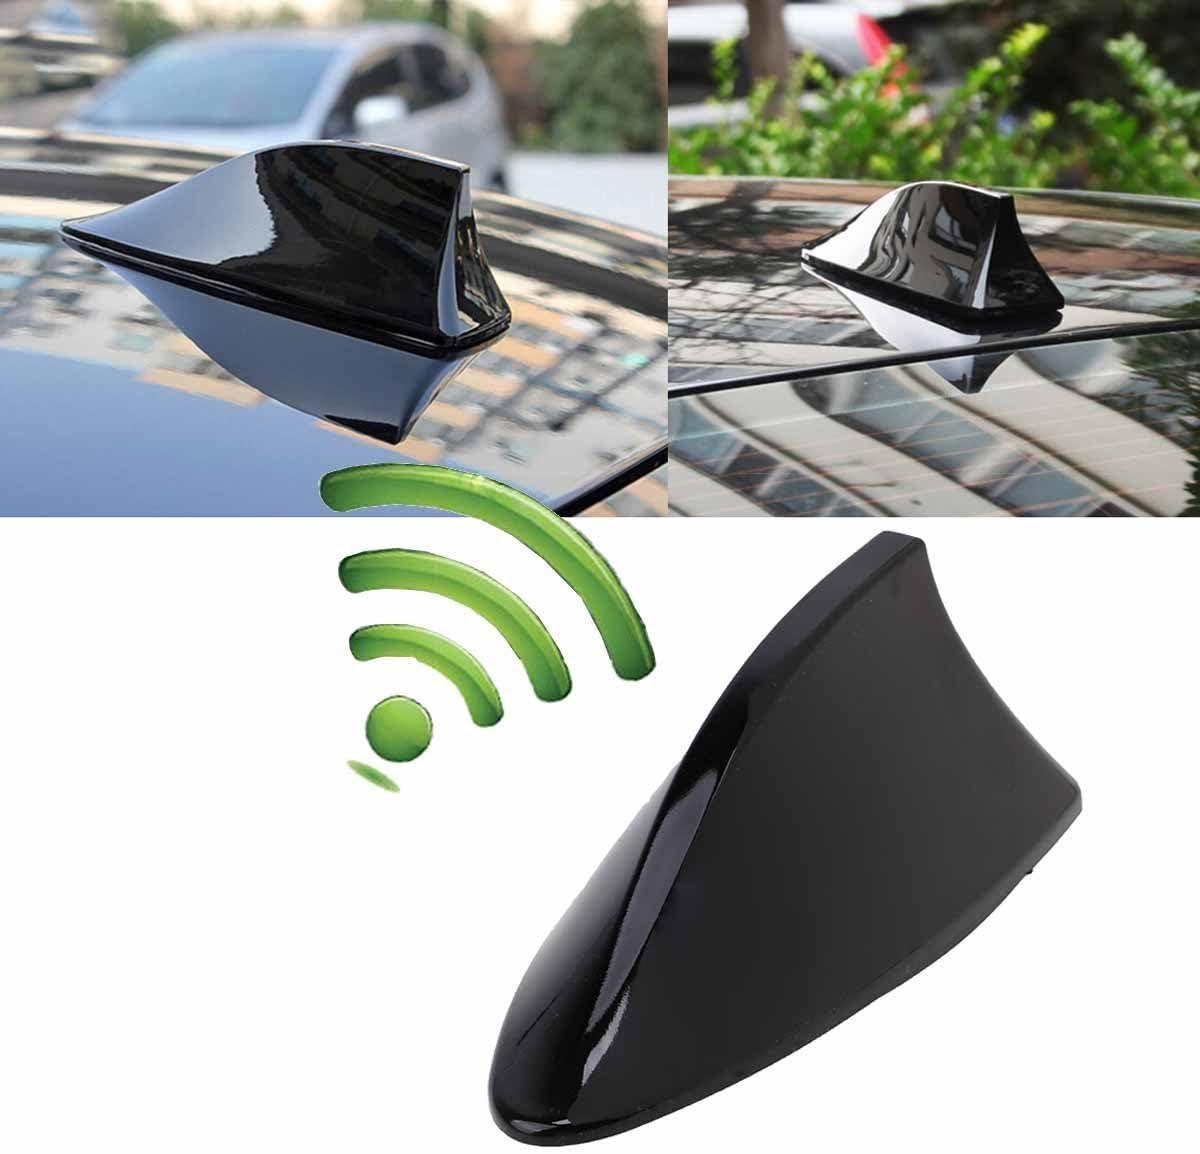 Possbay Car Shark Fin Antenna Aerial Universal AM//FM Radio Signal For Auto SUV Truck Van with Adhesive White